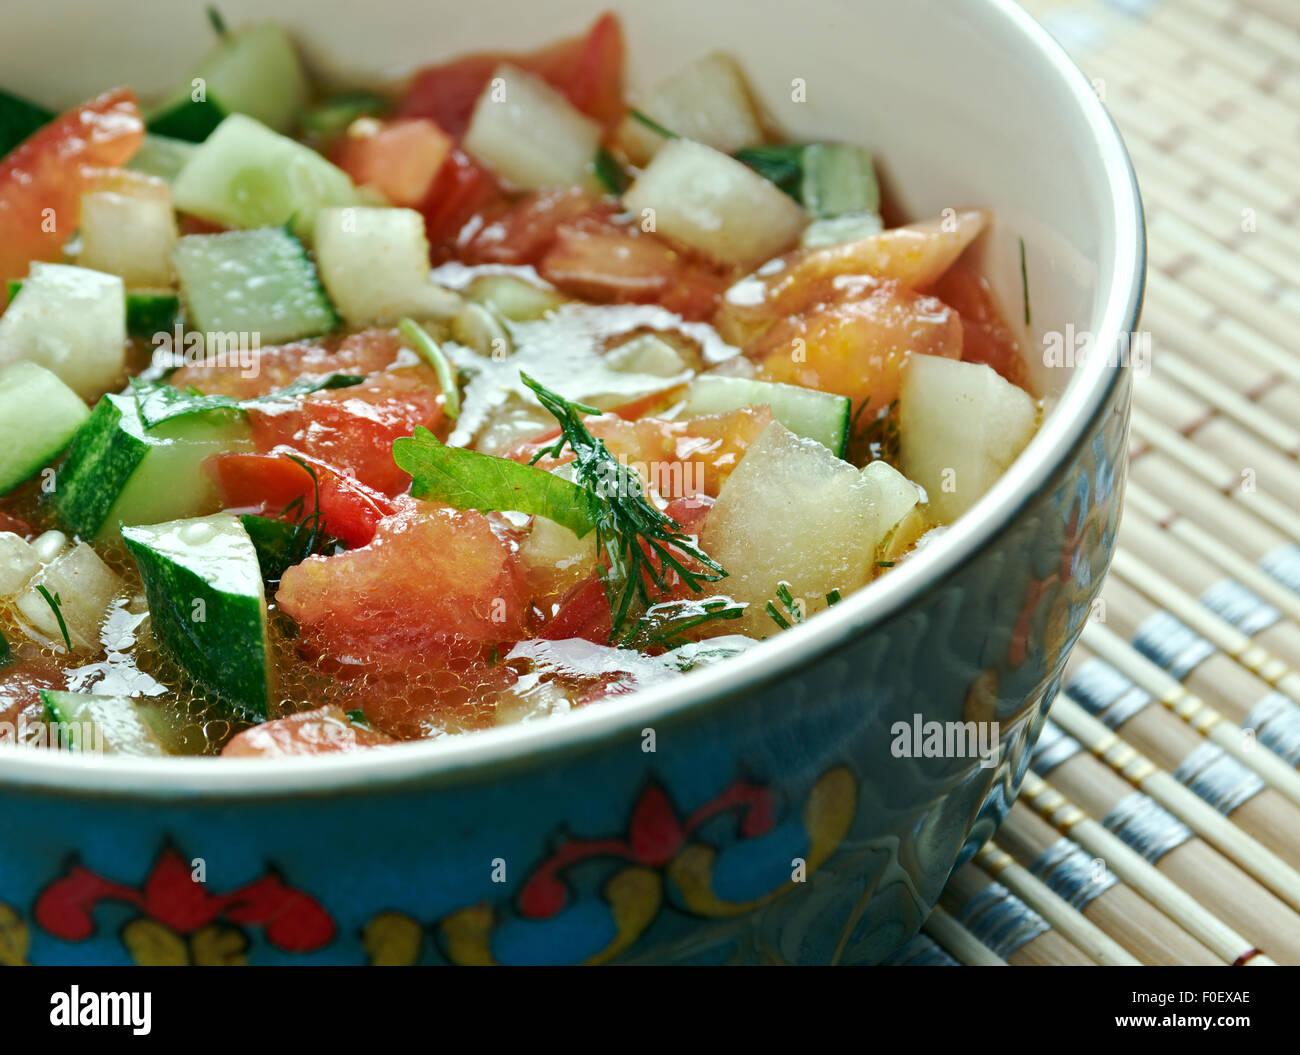 Kas?k Salat - mediterraner Salat. Türkische Gericht Gemüse. Stockbild